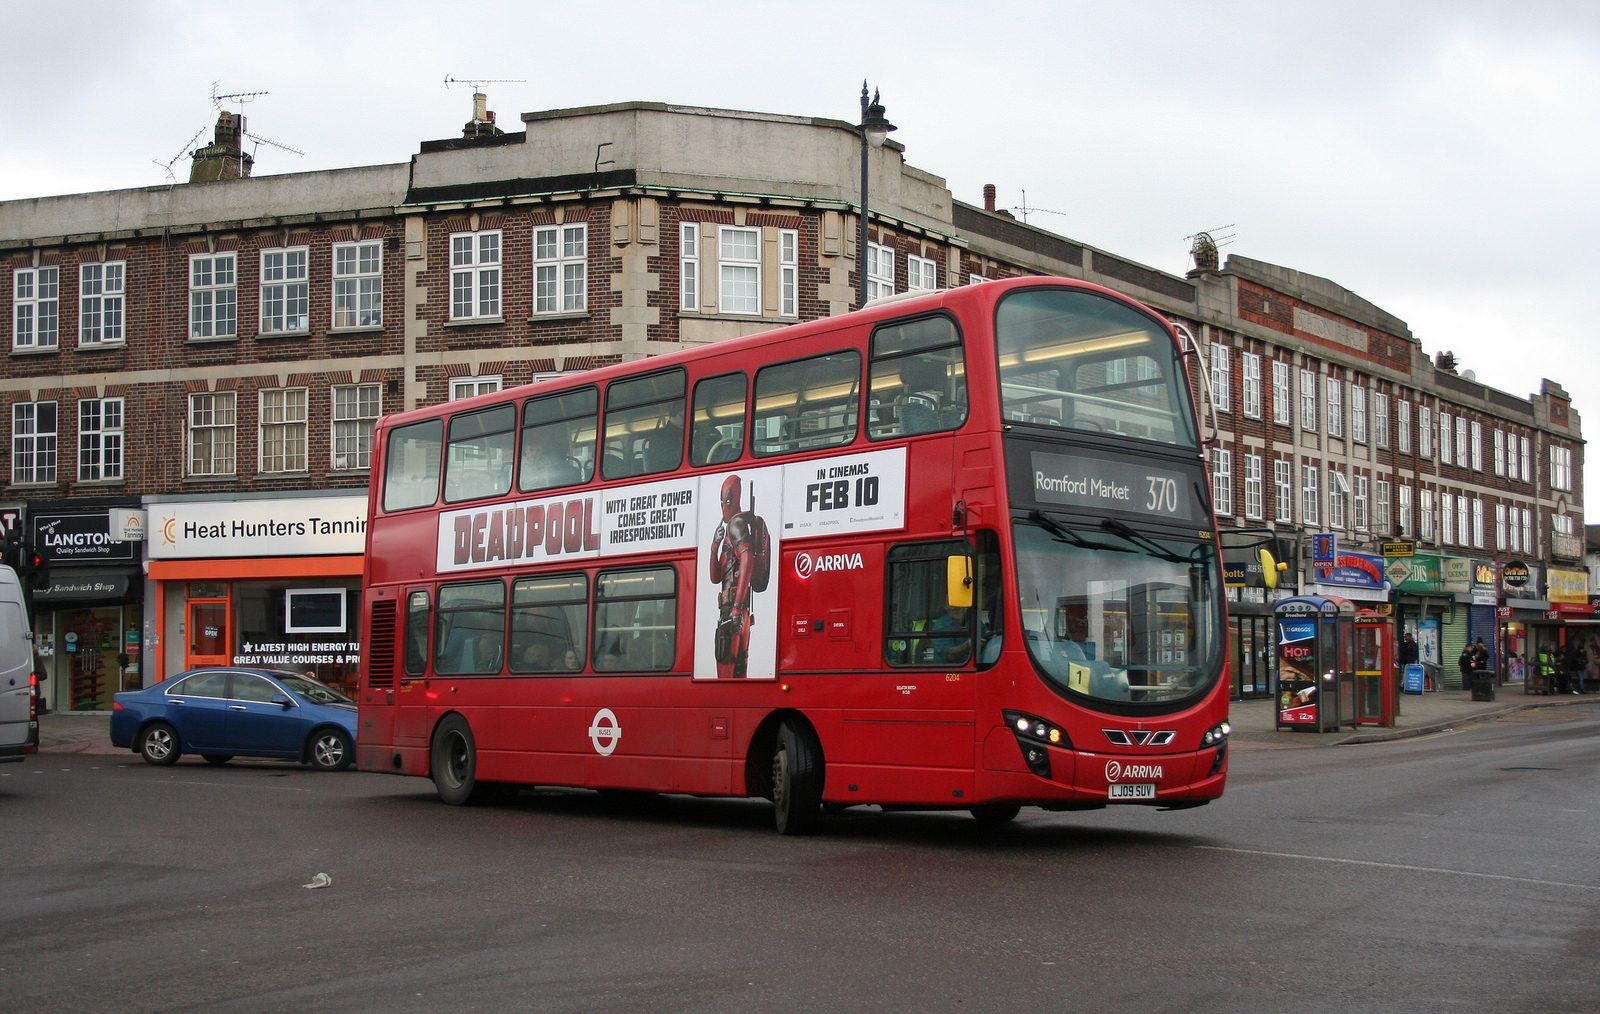 Pin On London Buses